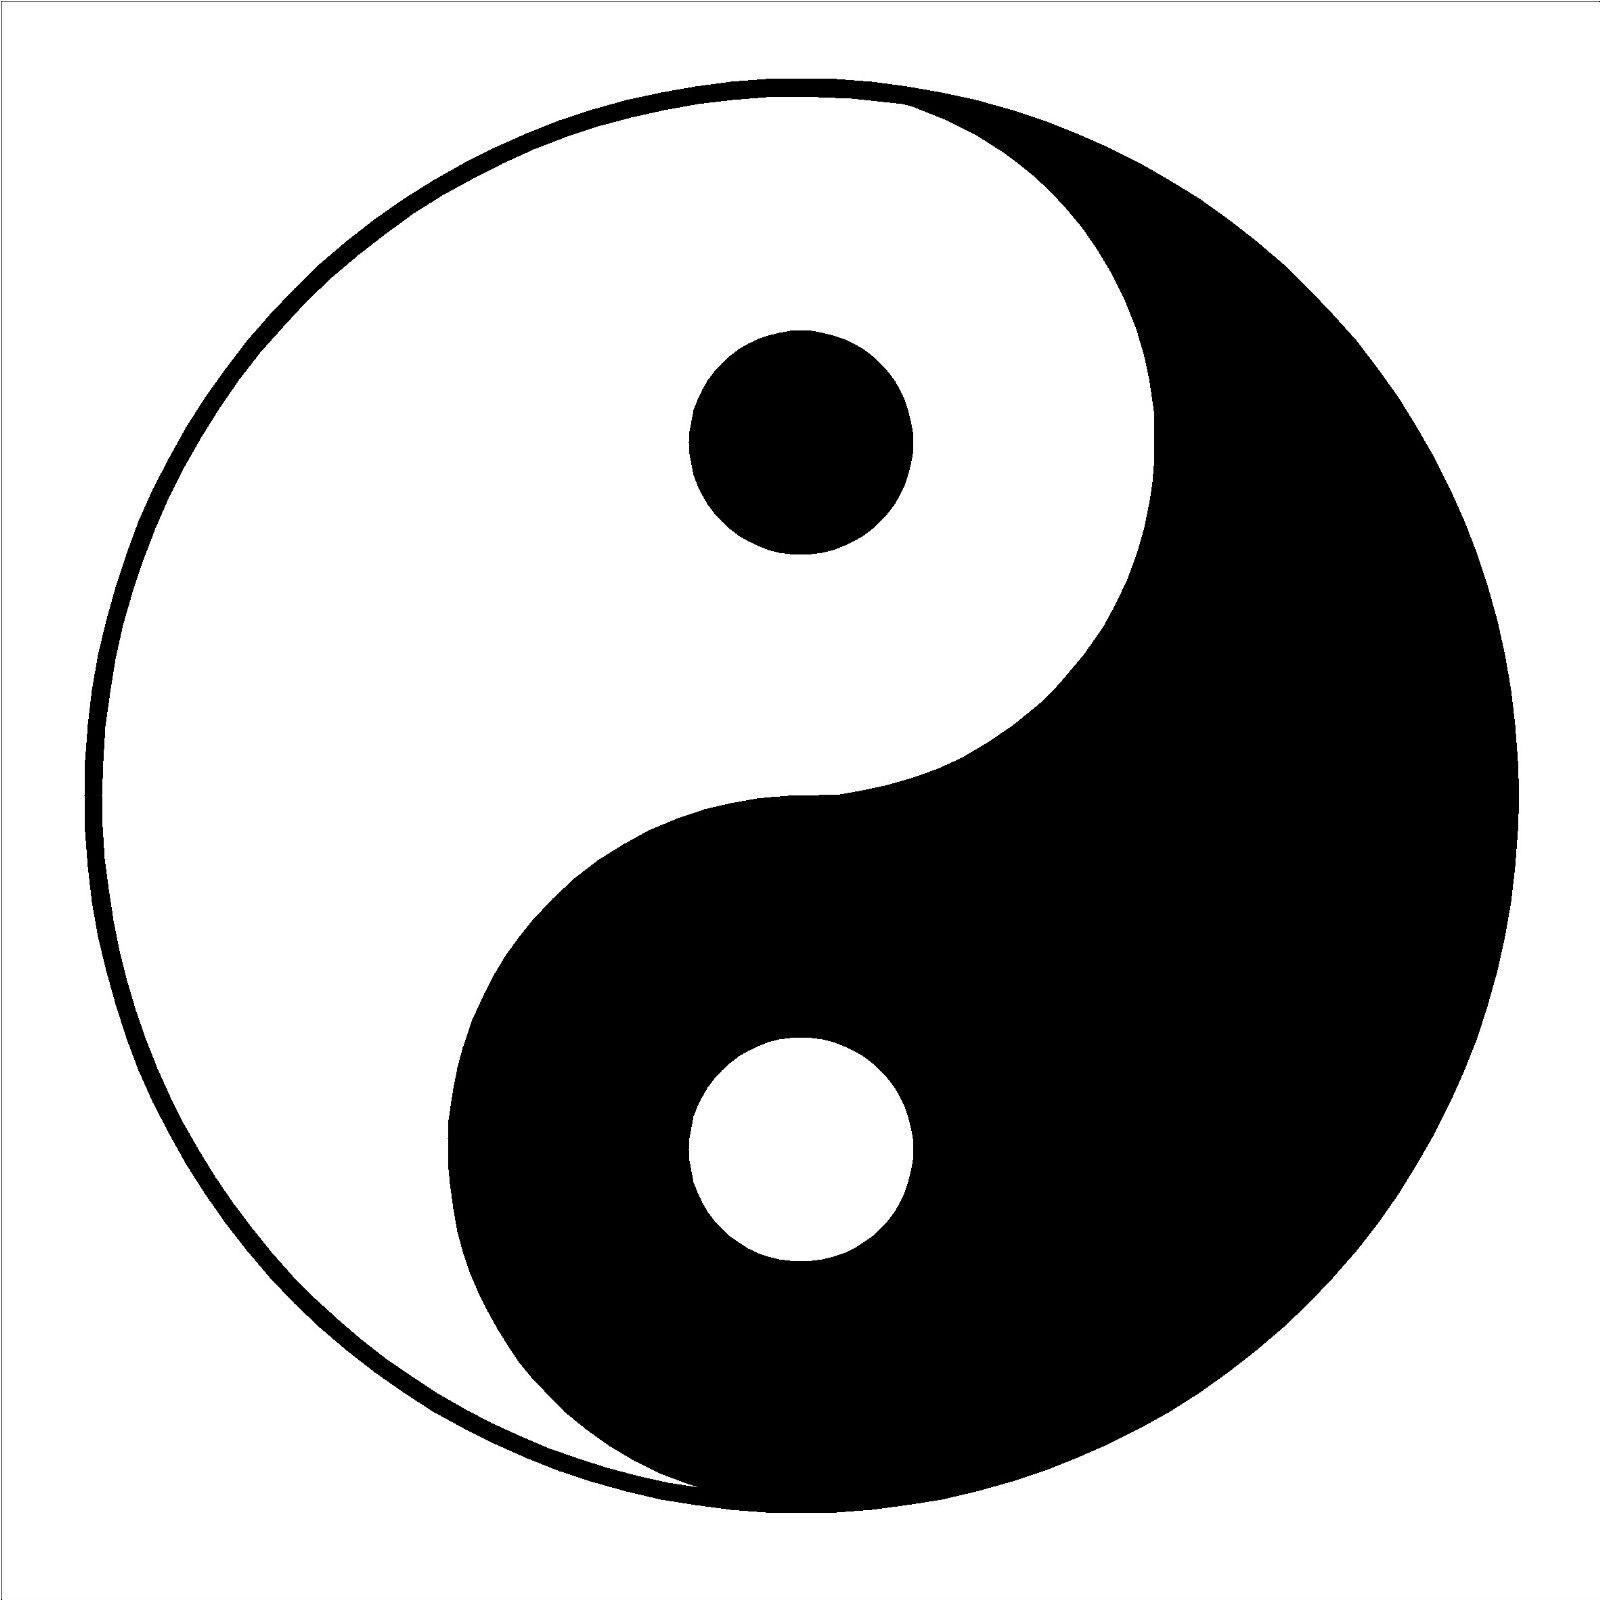 D189 Yin Yang Symbol Ying Yang Wall Art Room Sticker Vinyl Decal